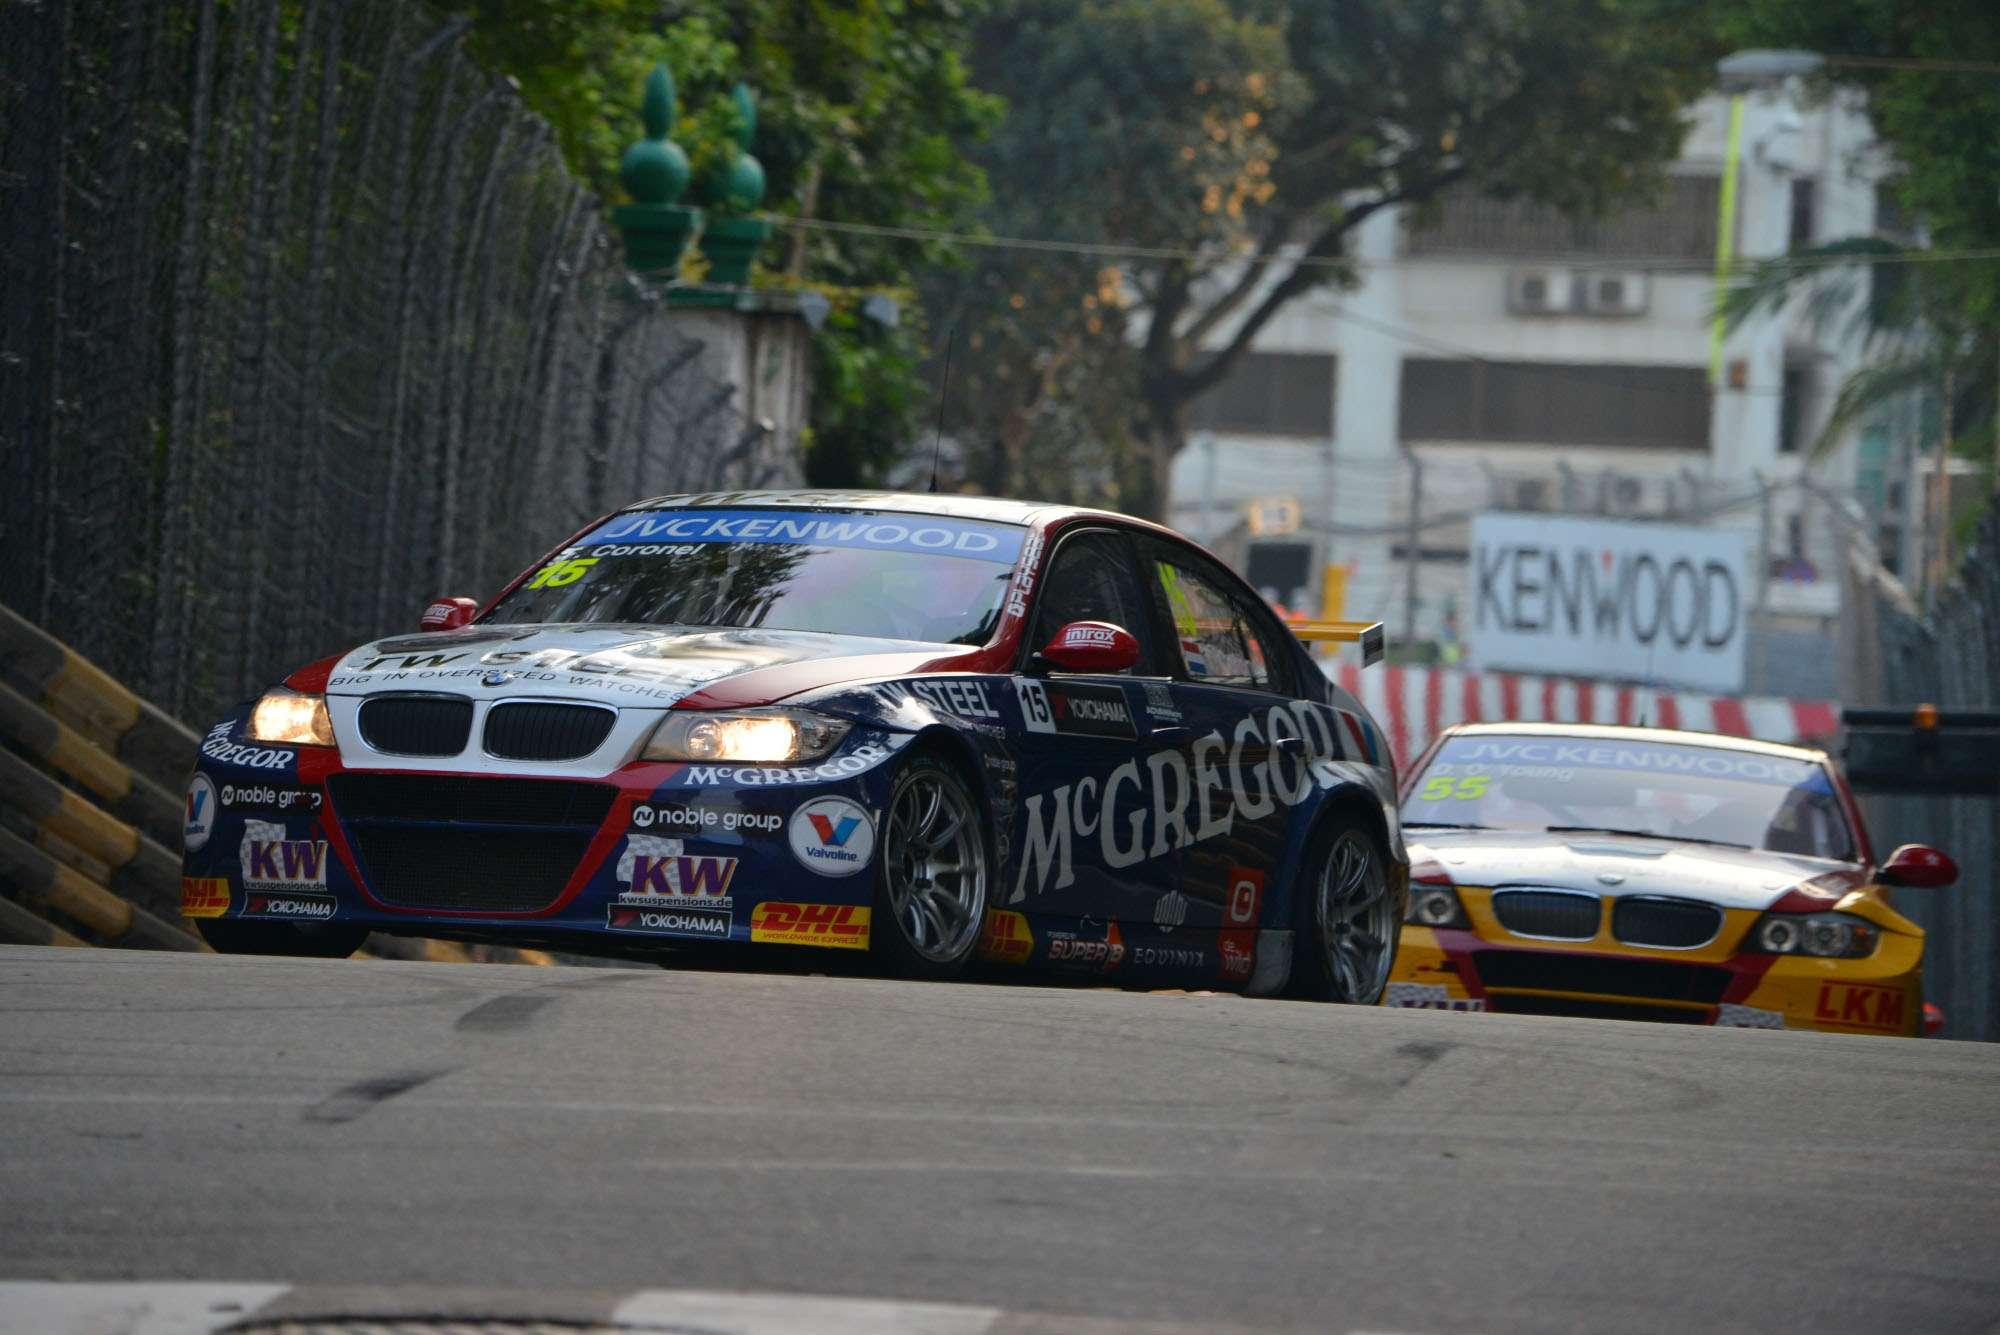 World Touring Car Championship 2013, Round 12, Macau